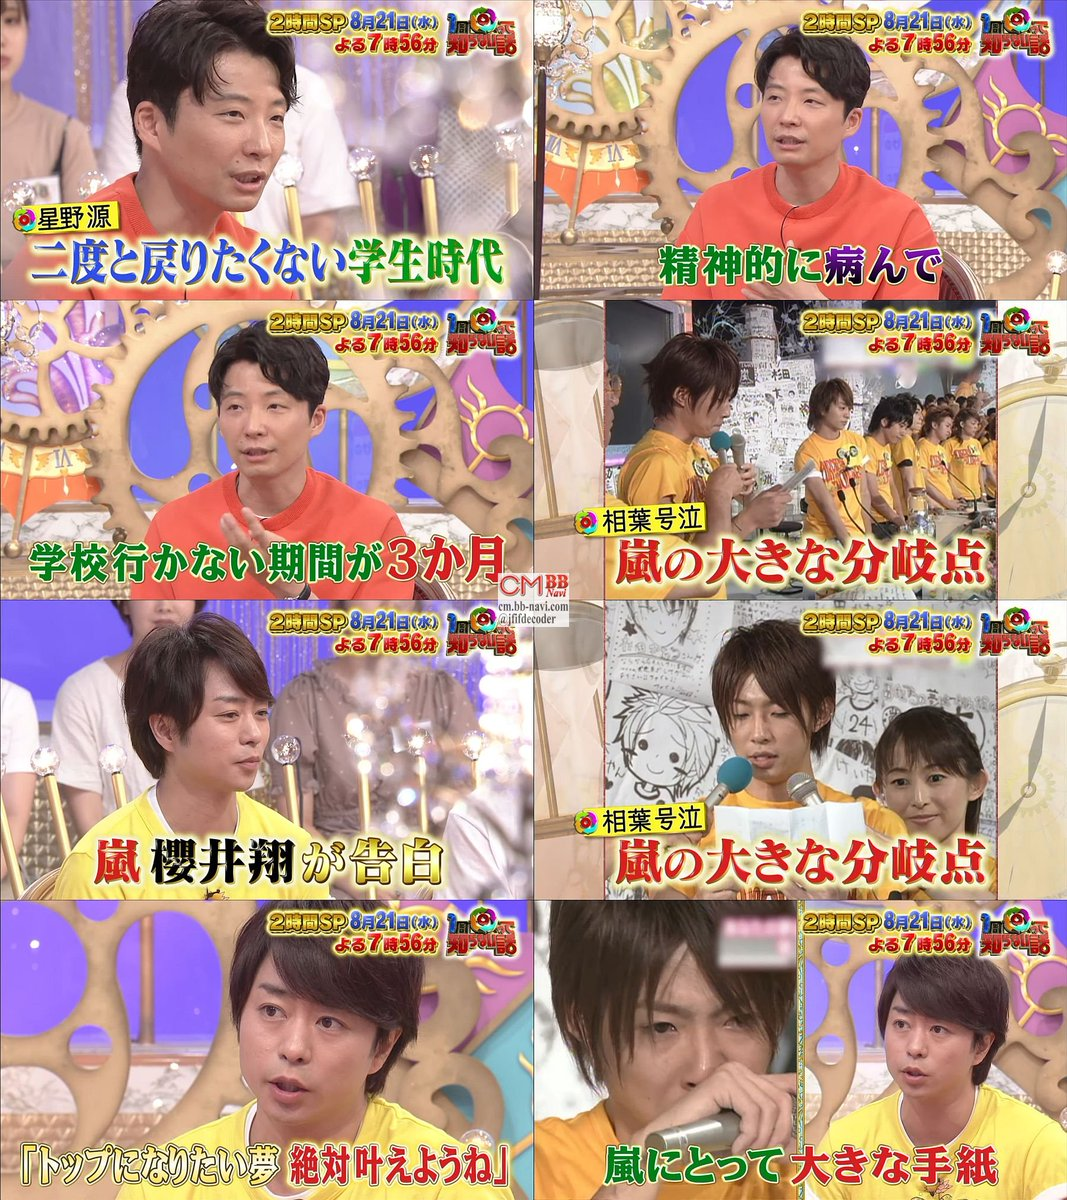 TV番組 1周回って知らない話(08/21)番宣 CM 30秒版 星野源,福原愛 ...